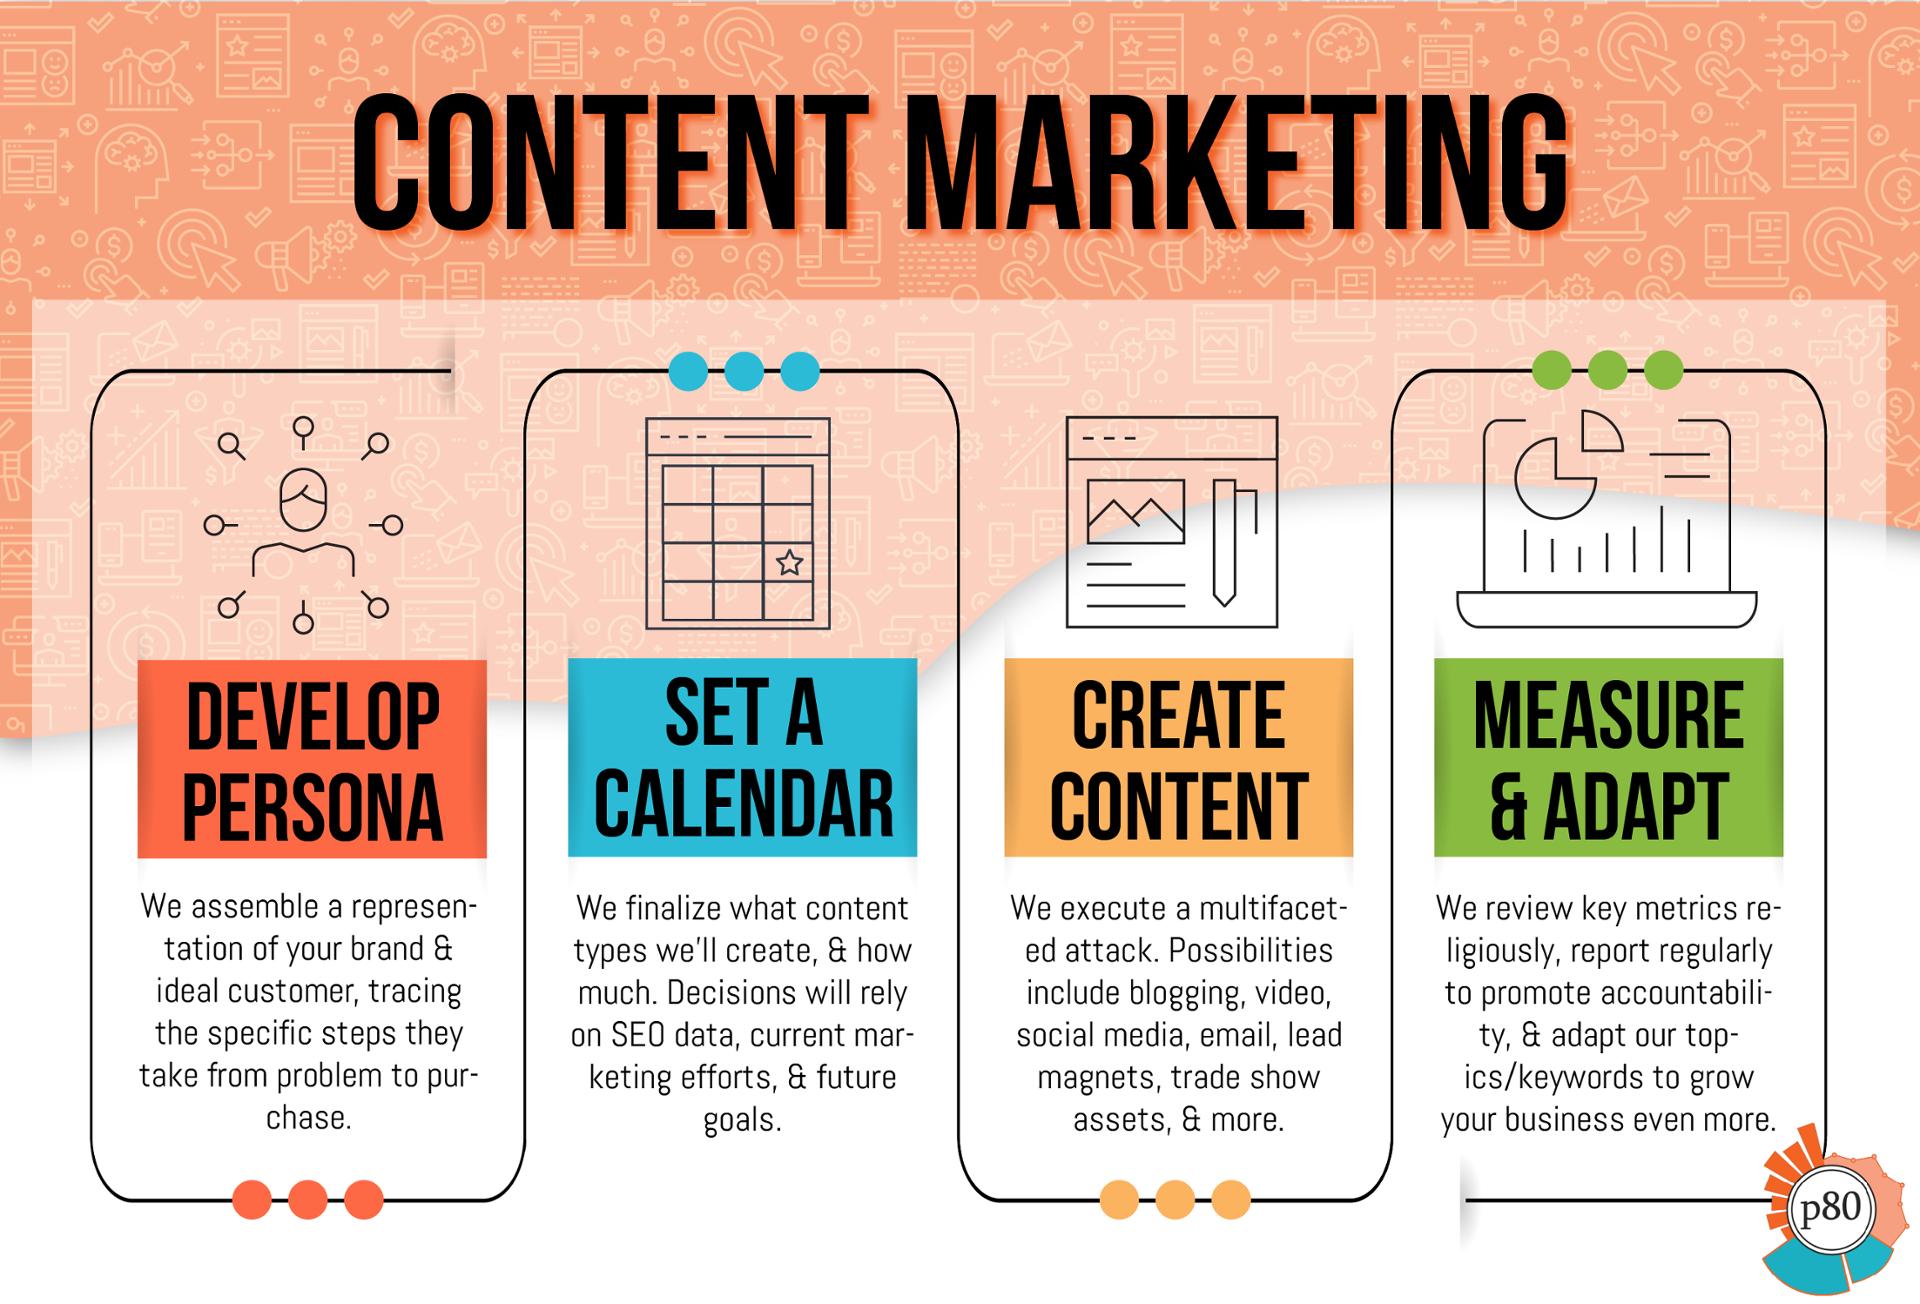 inbound marketing services infographic - Content Marketing Infograph - shrunk